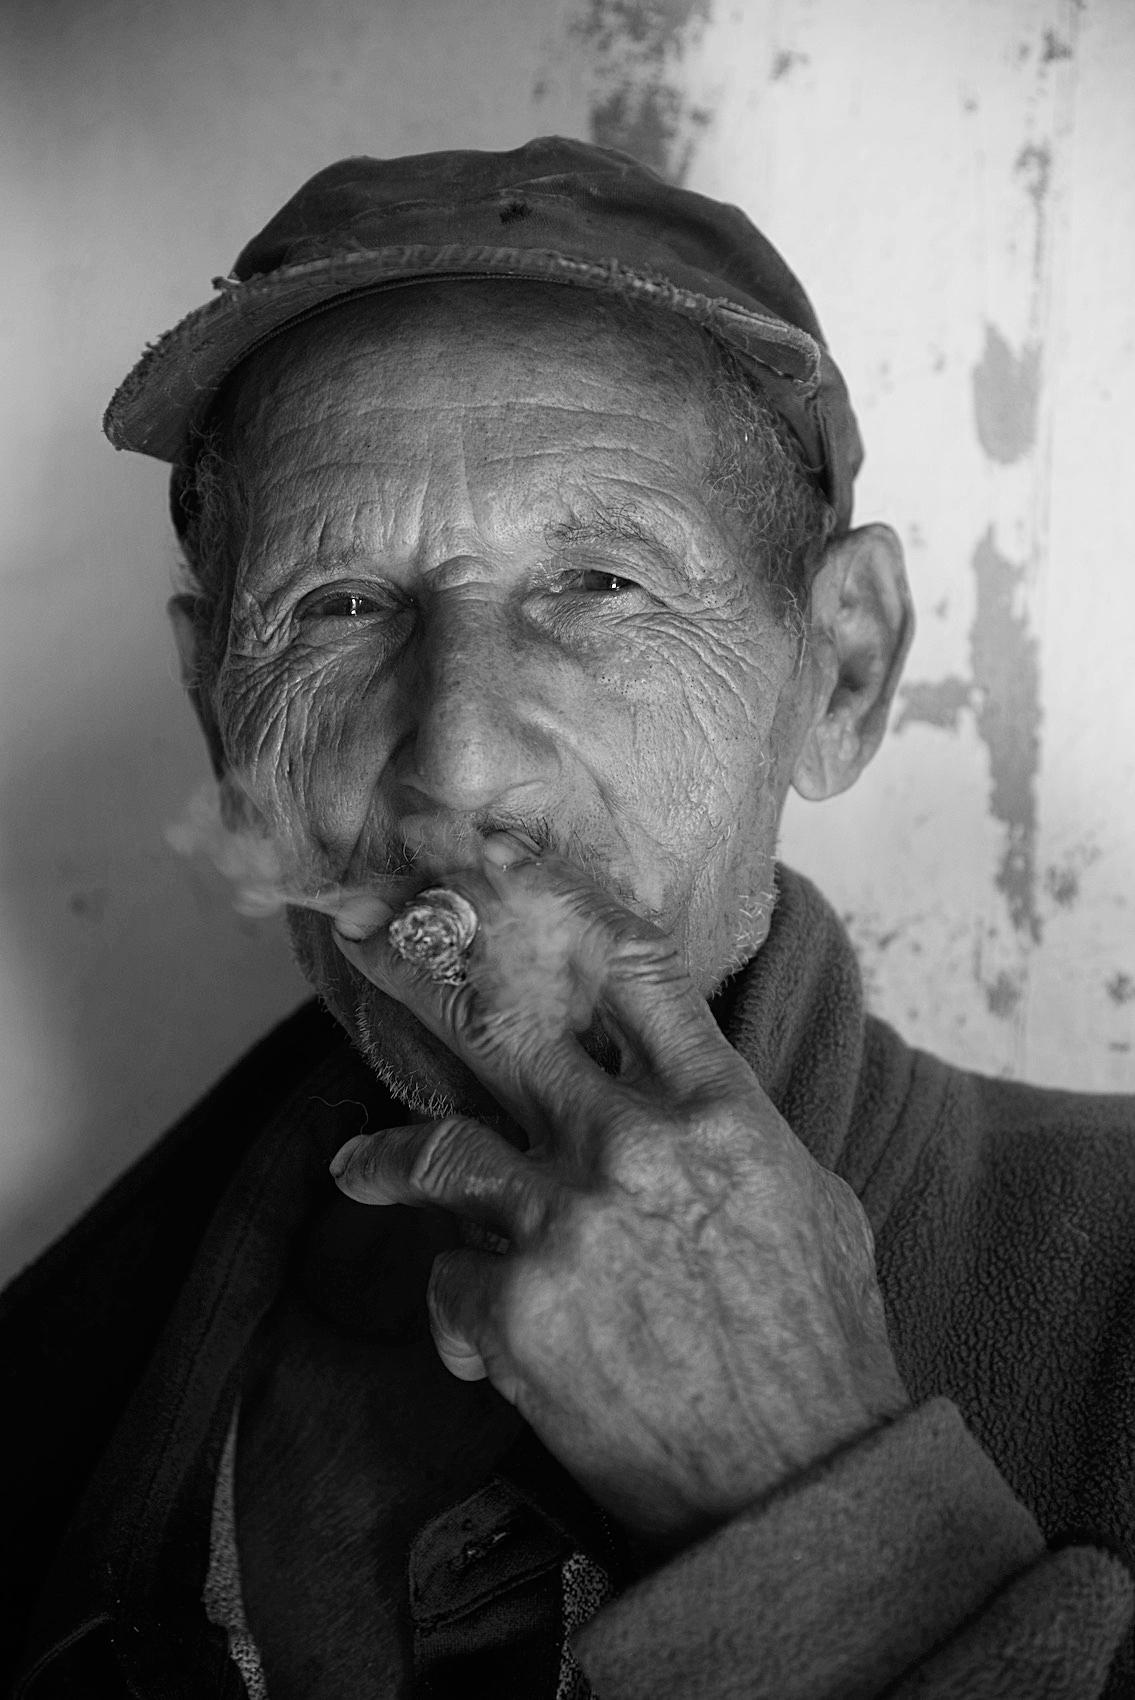 older man portrait